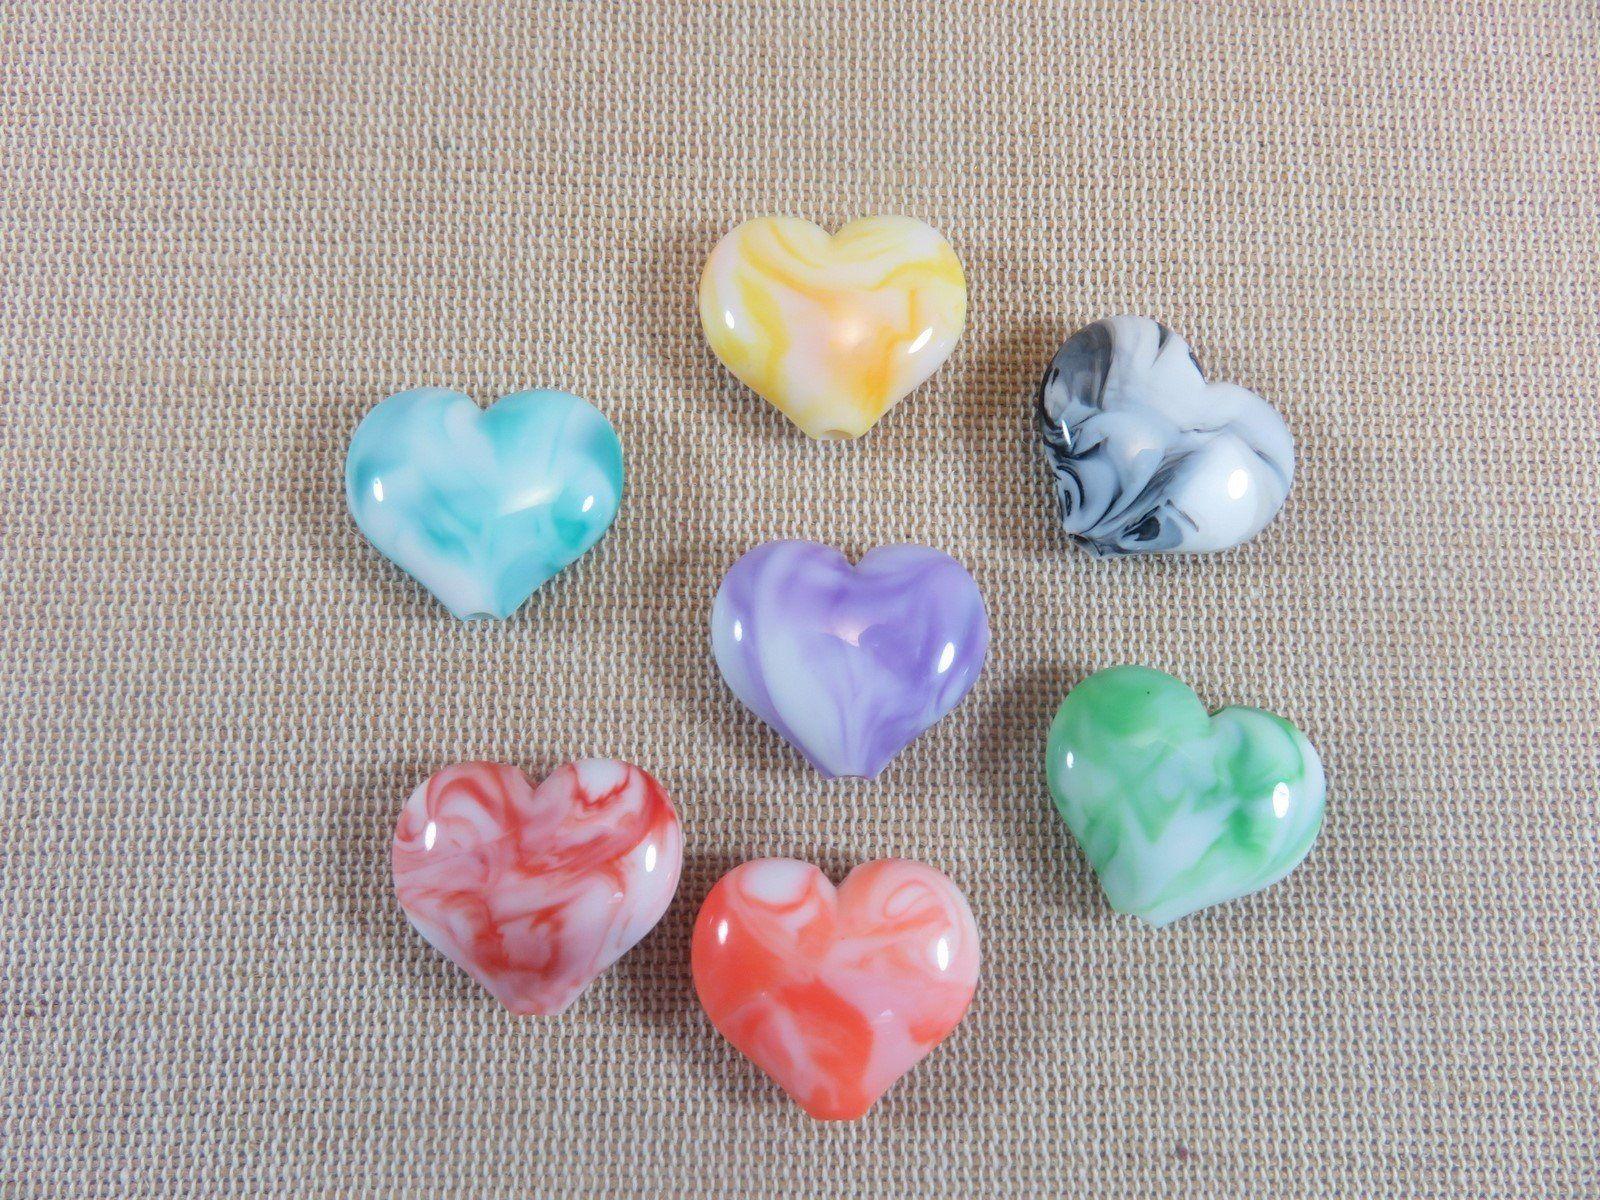 Lot 10-20 Perles Rayée Acrilique 8mm Marbrées Creation bijoux marbre raye